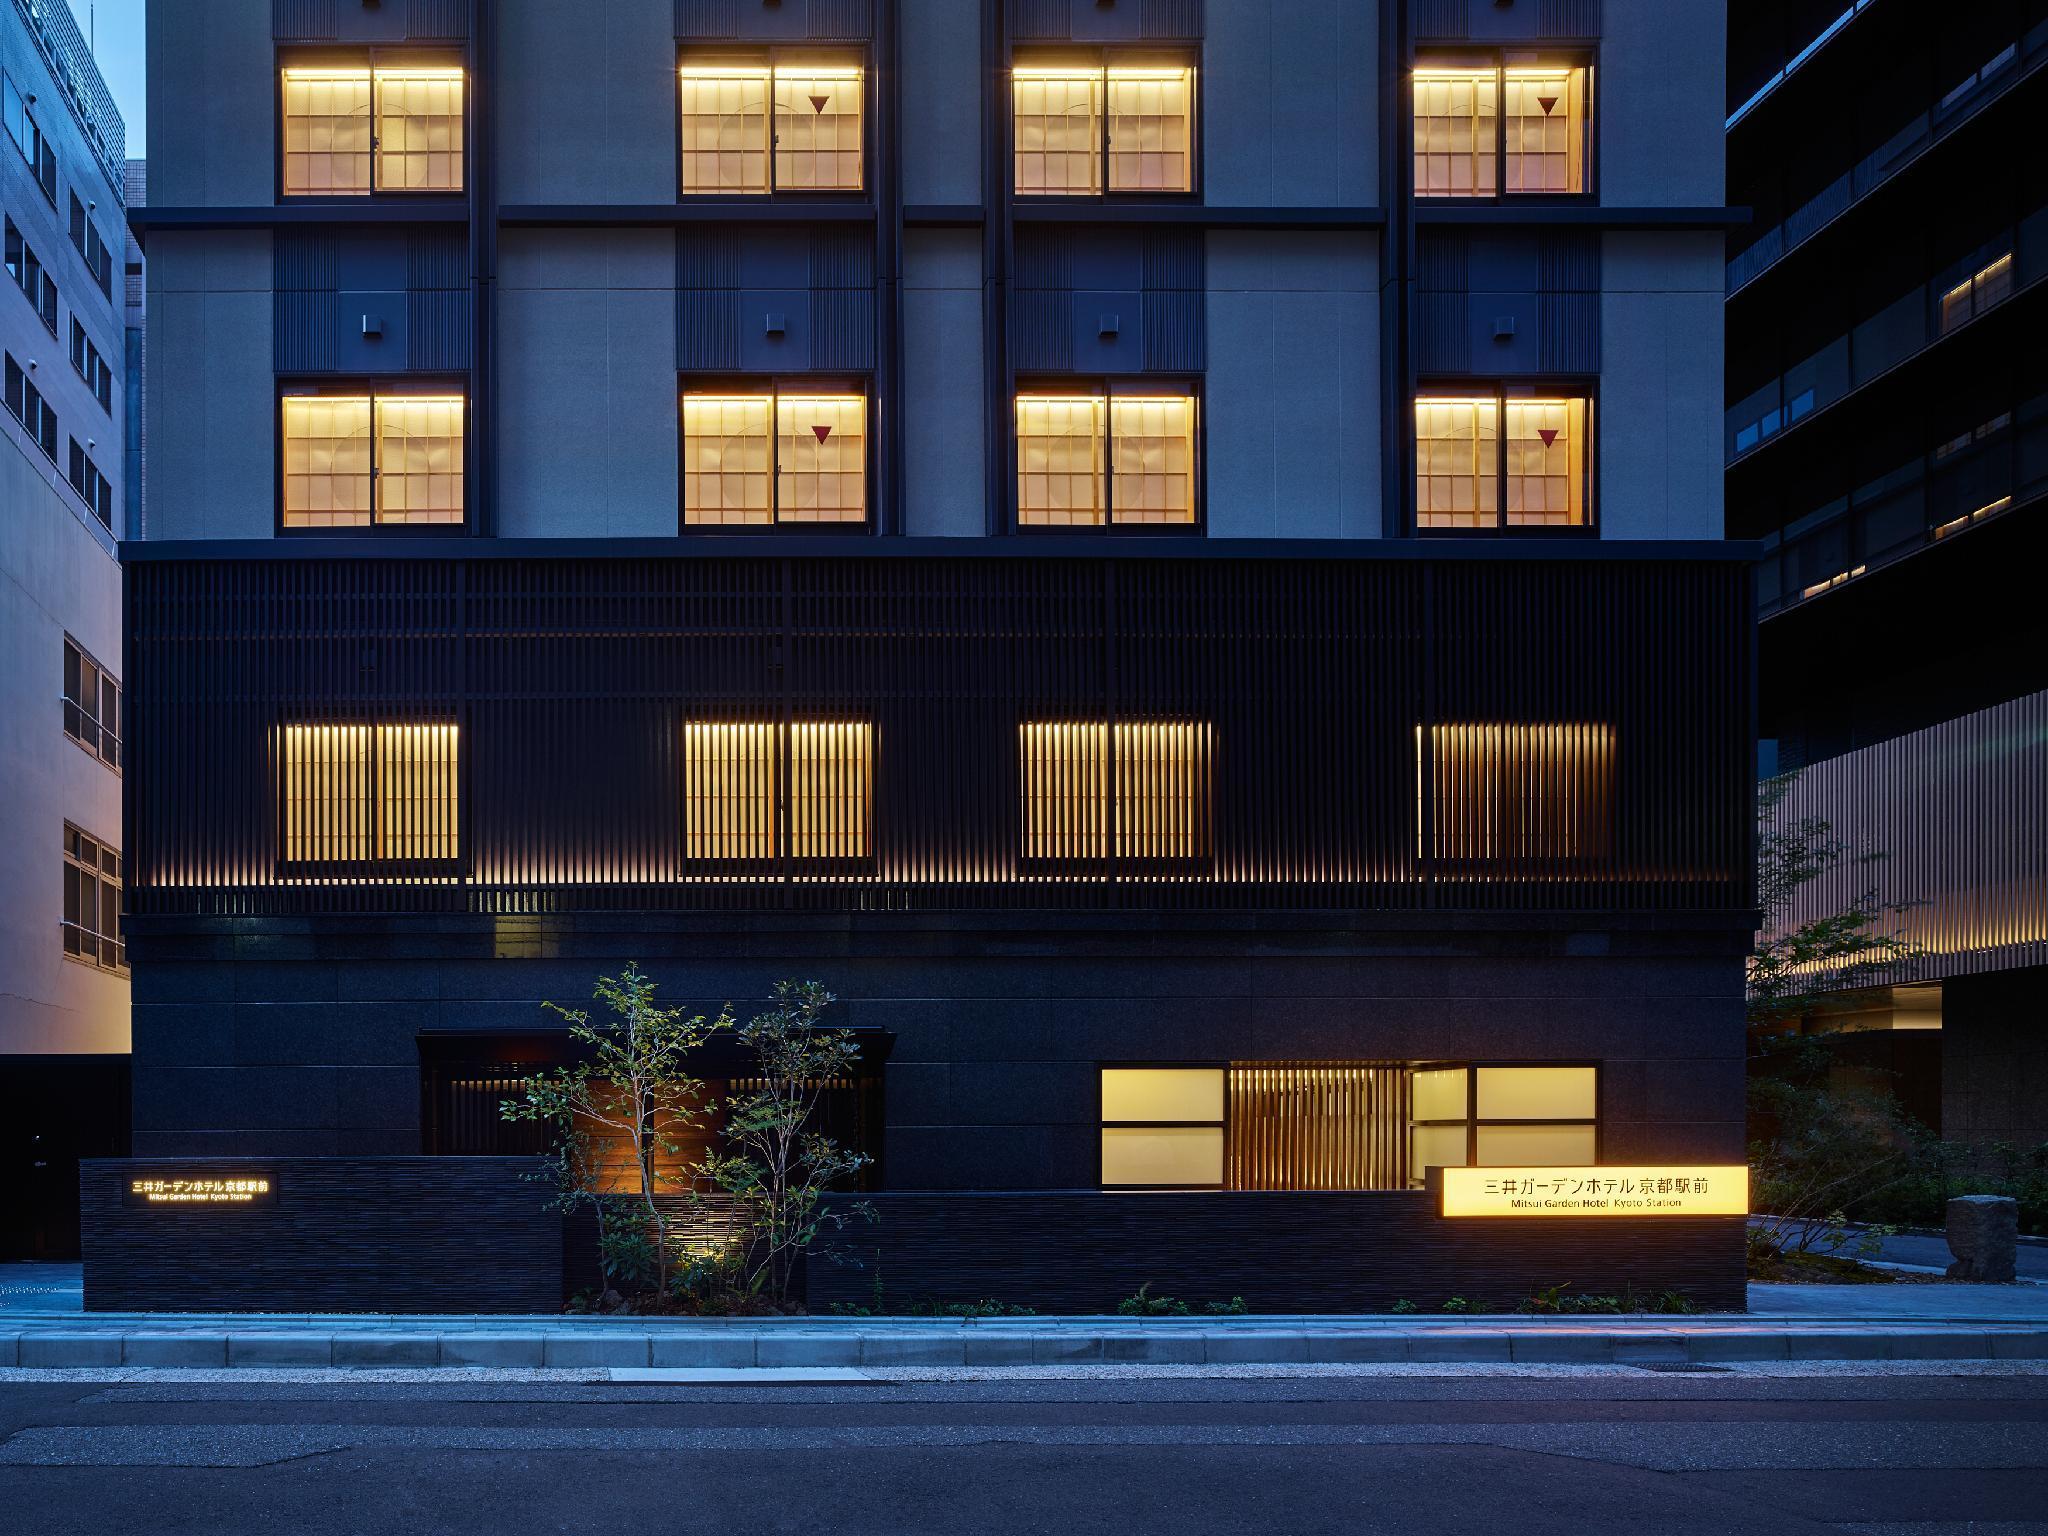 Mitsui Garden Hotel Kyoto Station Jepang Mulai Dari Rp